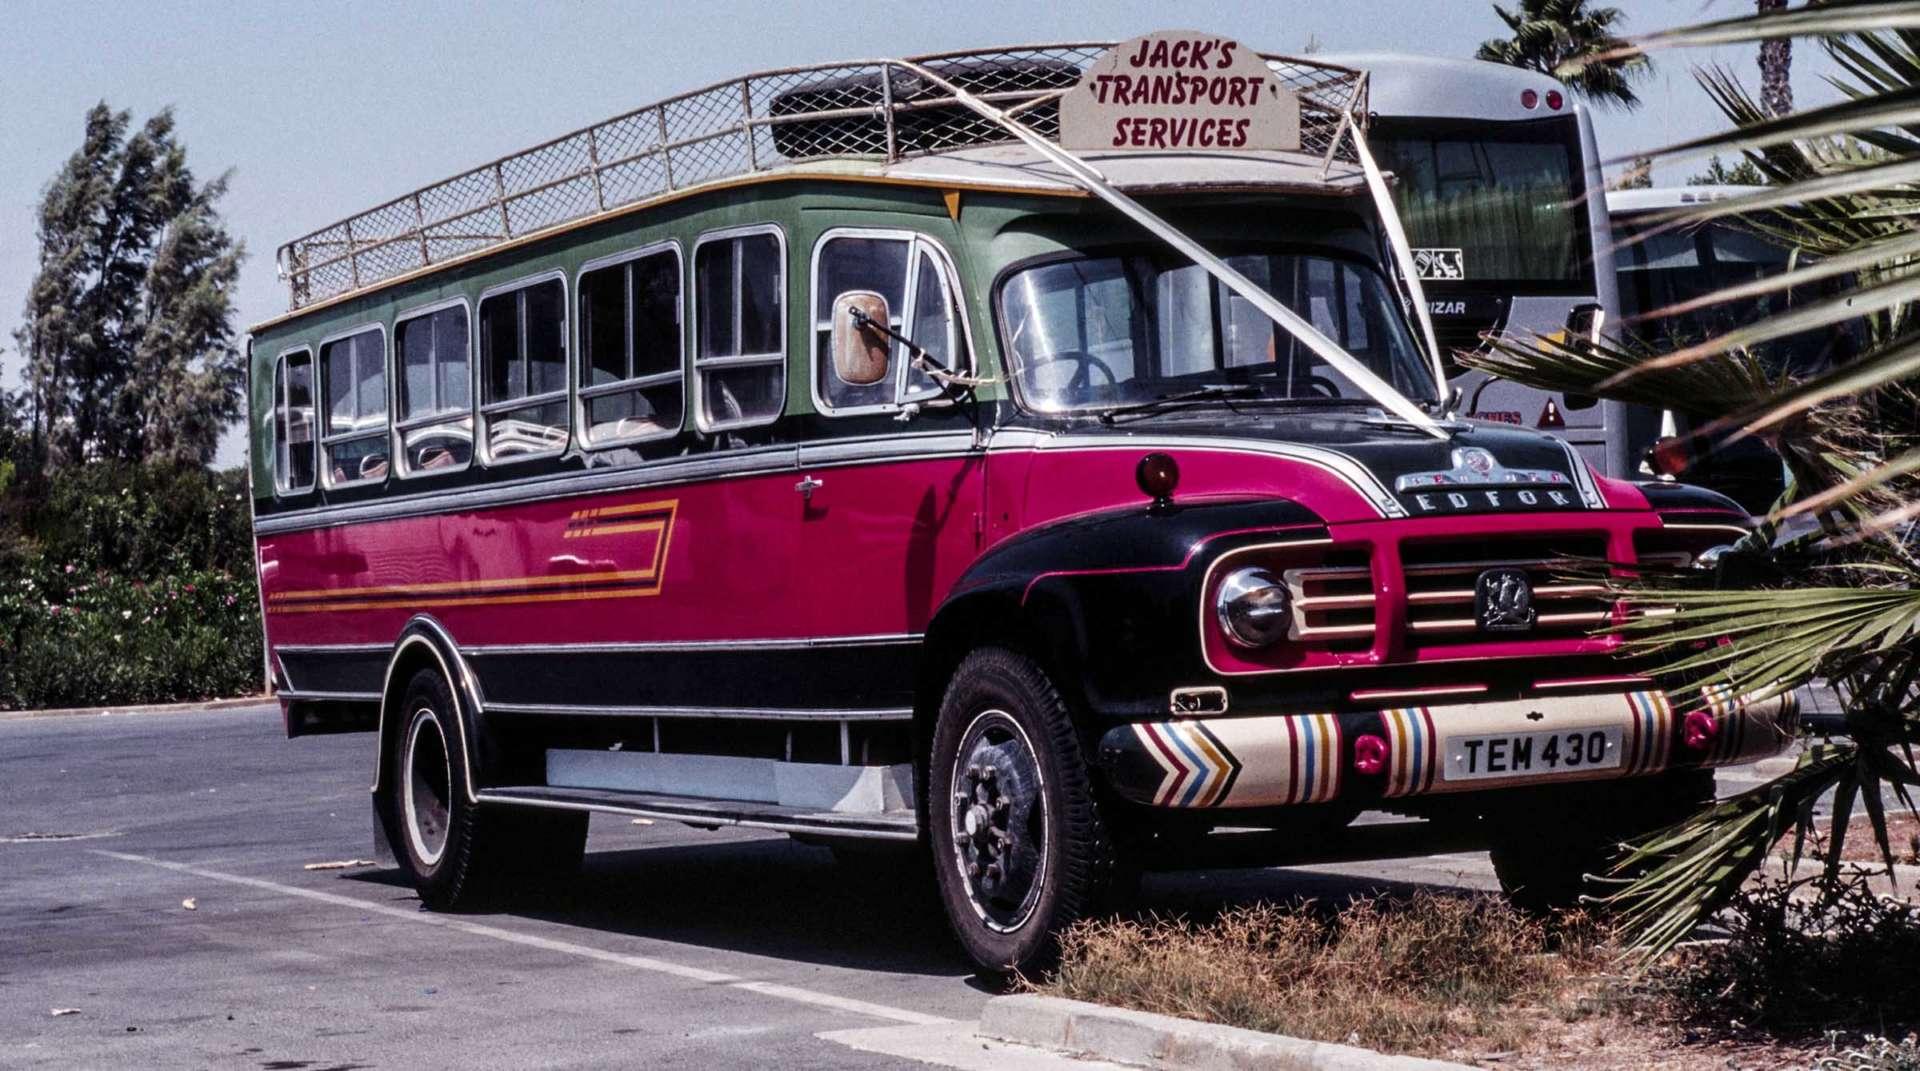 Reifer großer Esel im Bus